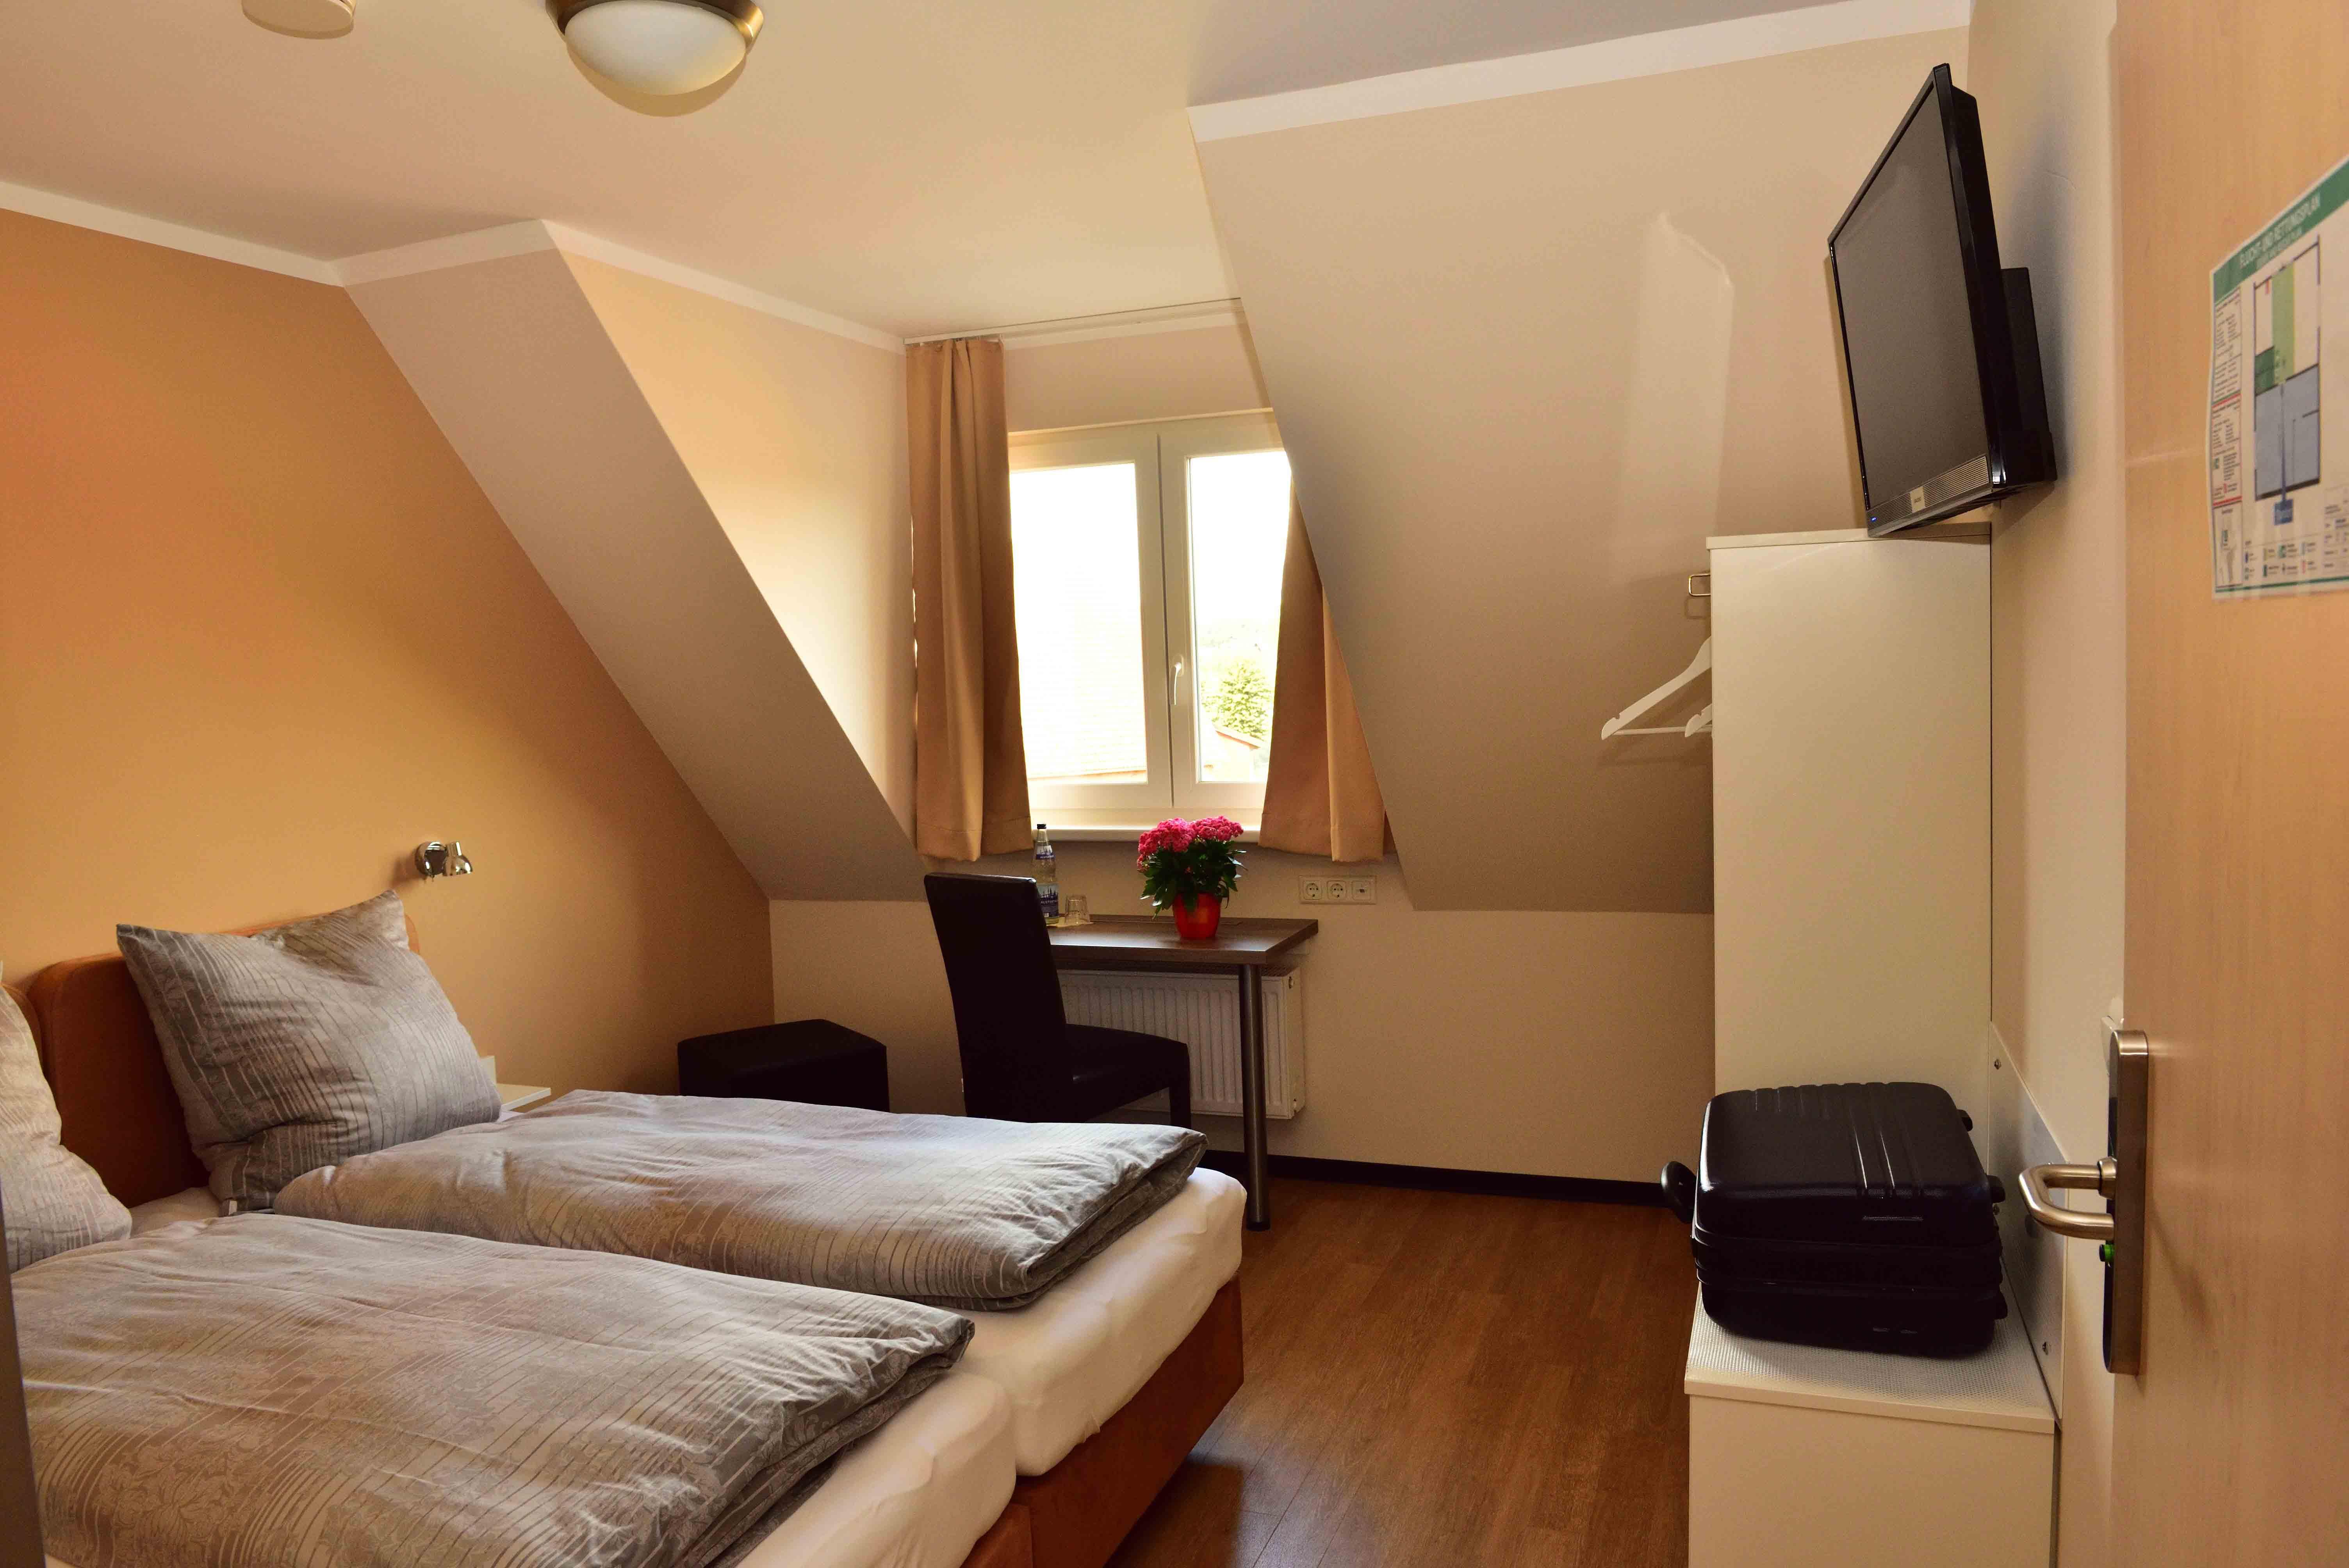 Hotel Garnilo, Stapelfeld (Hotel garni)